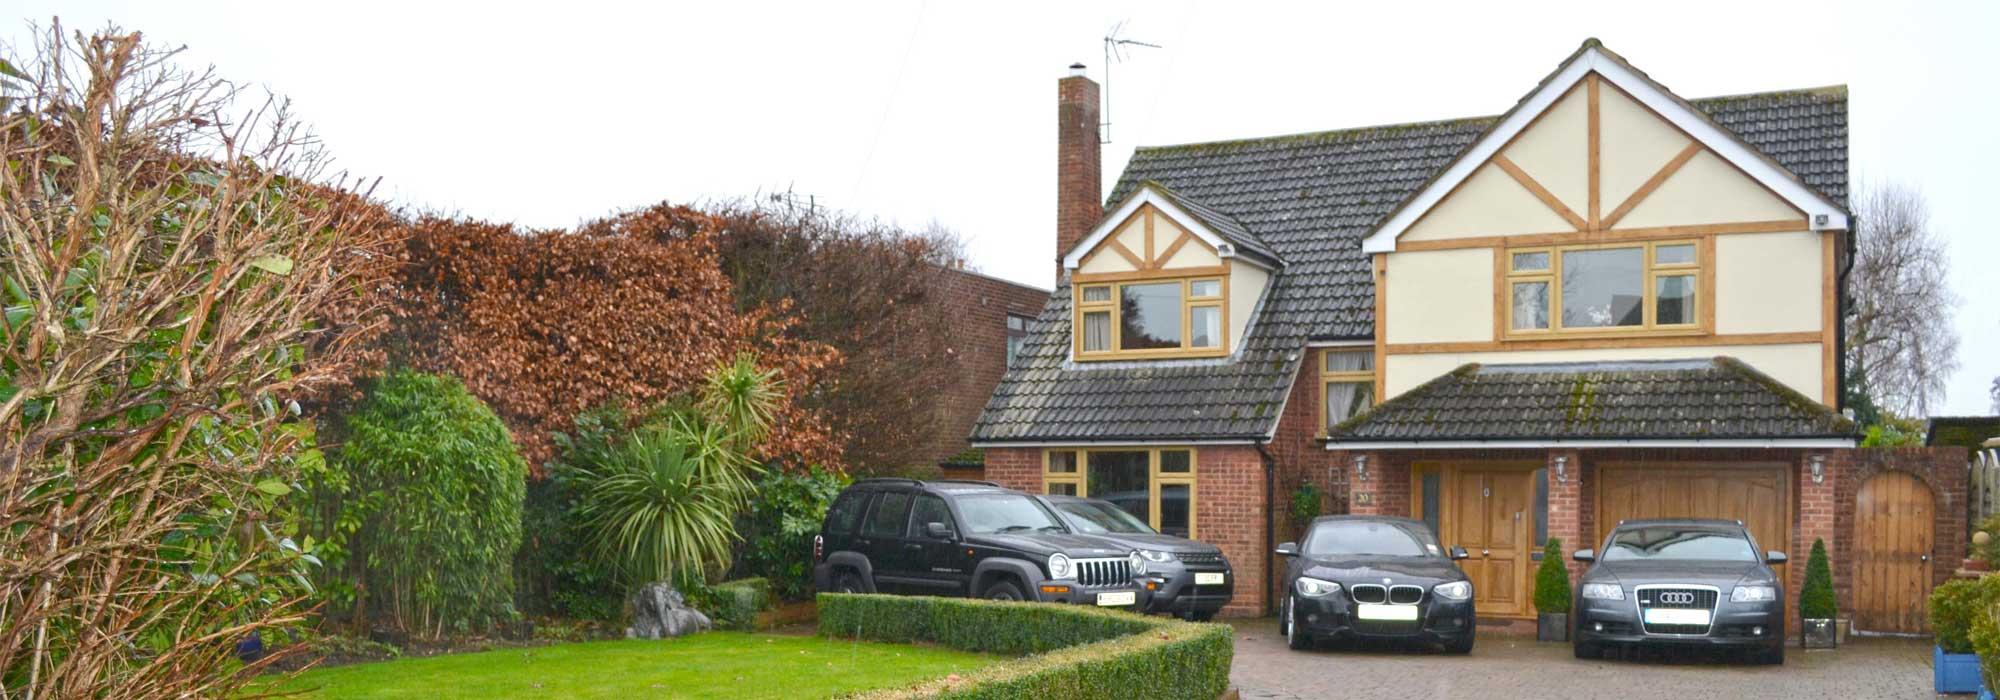 Stratfield Drive, Broxbourne, Hertfordshire, EN10 7NU